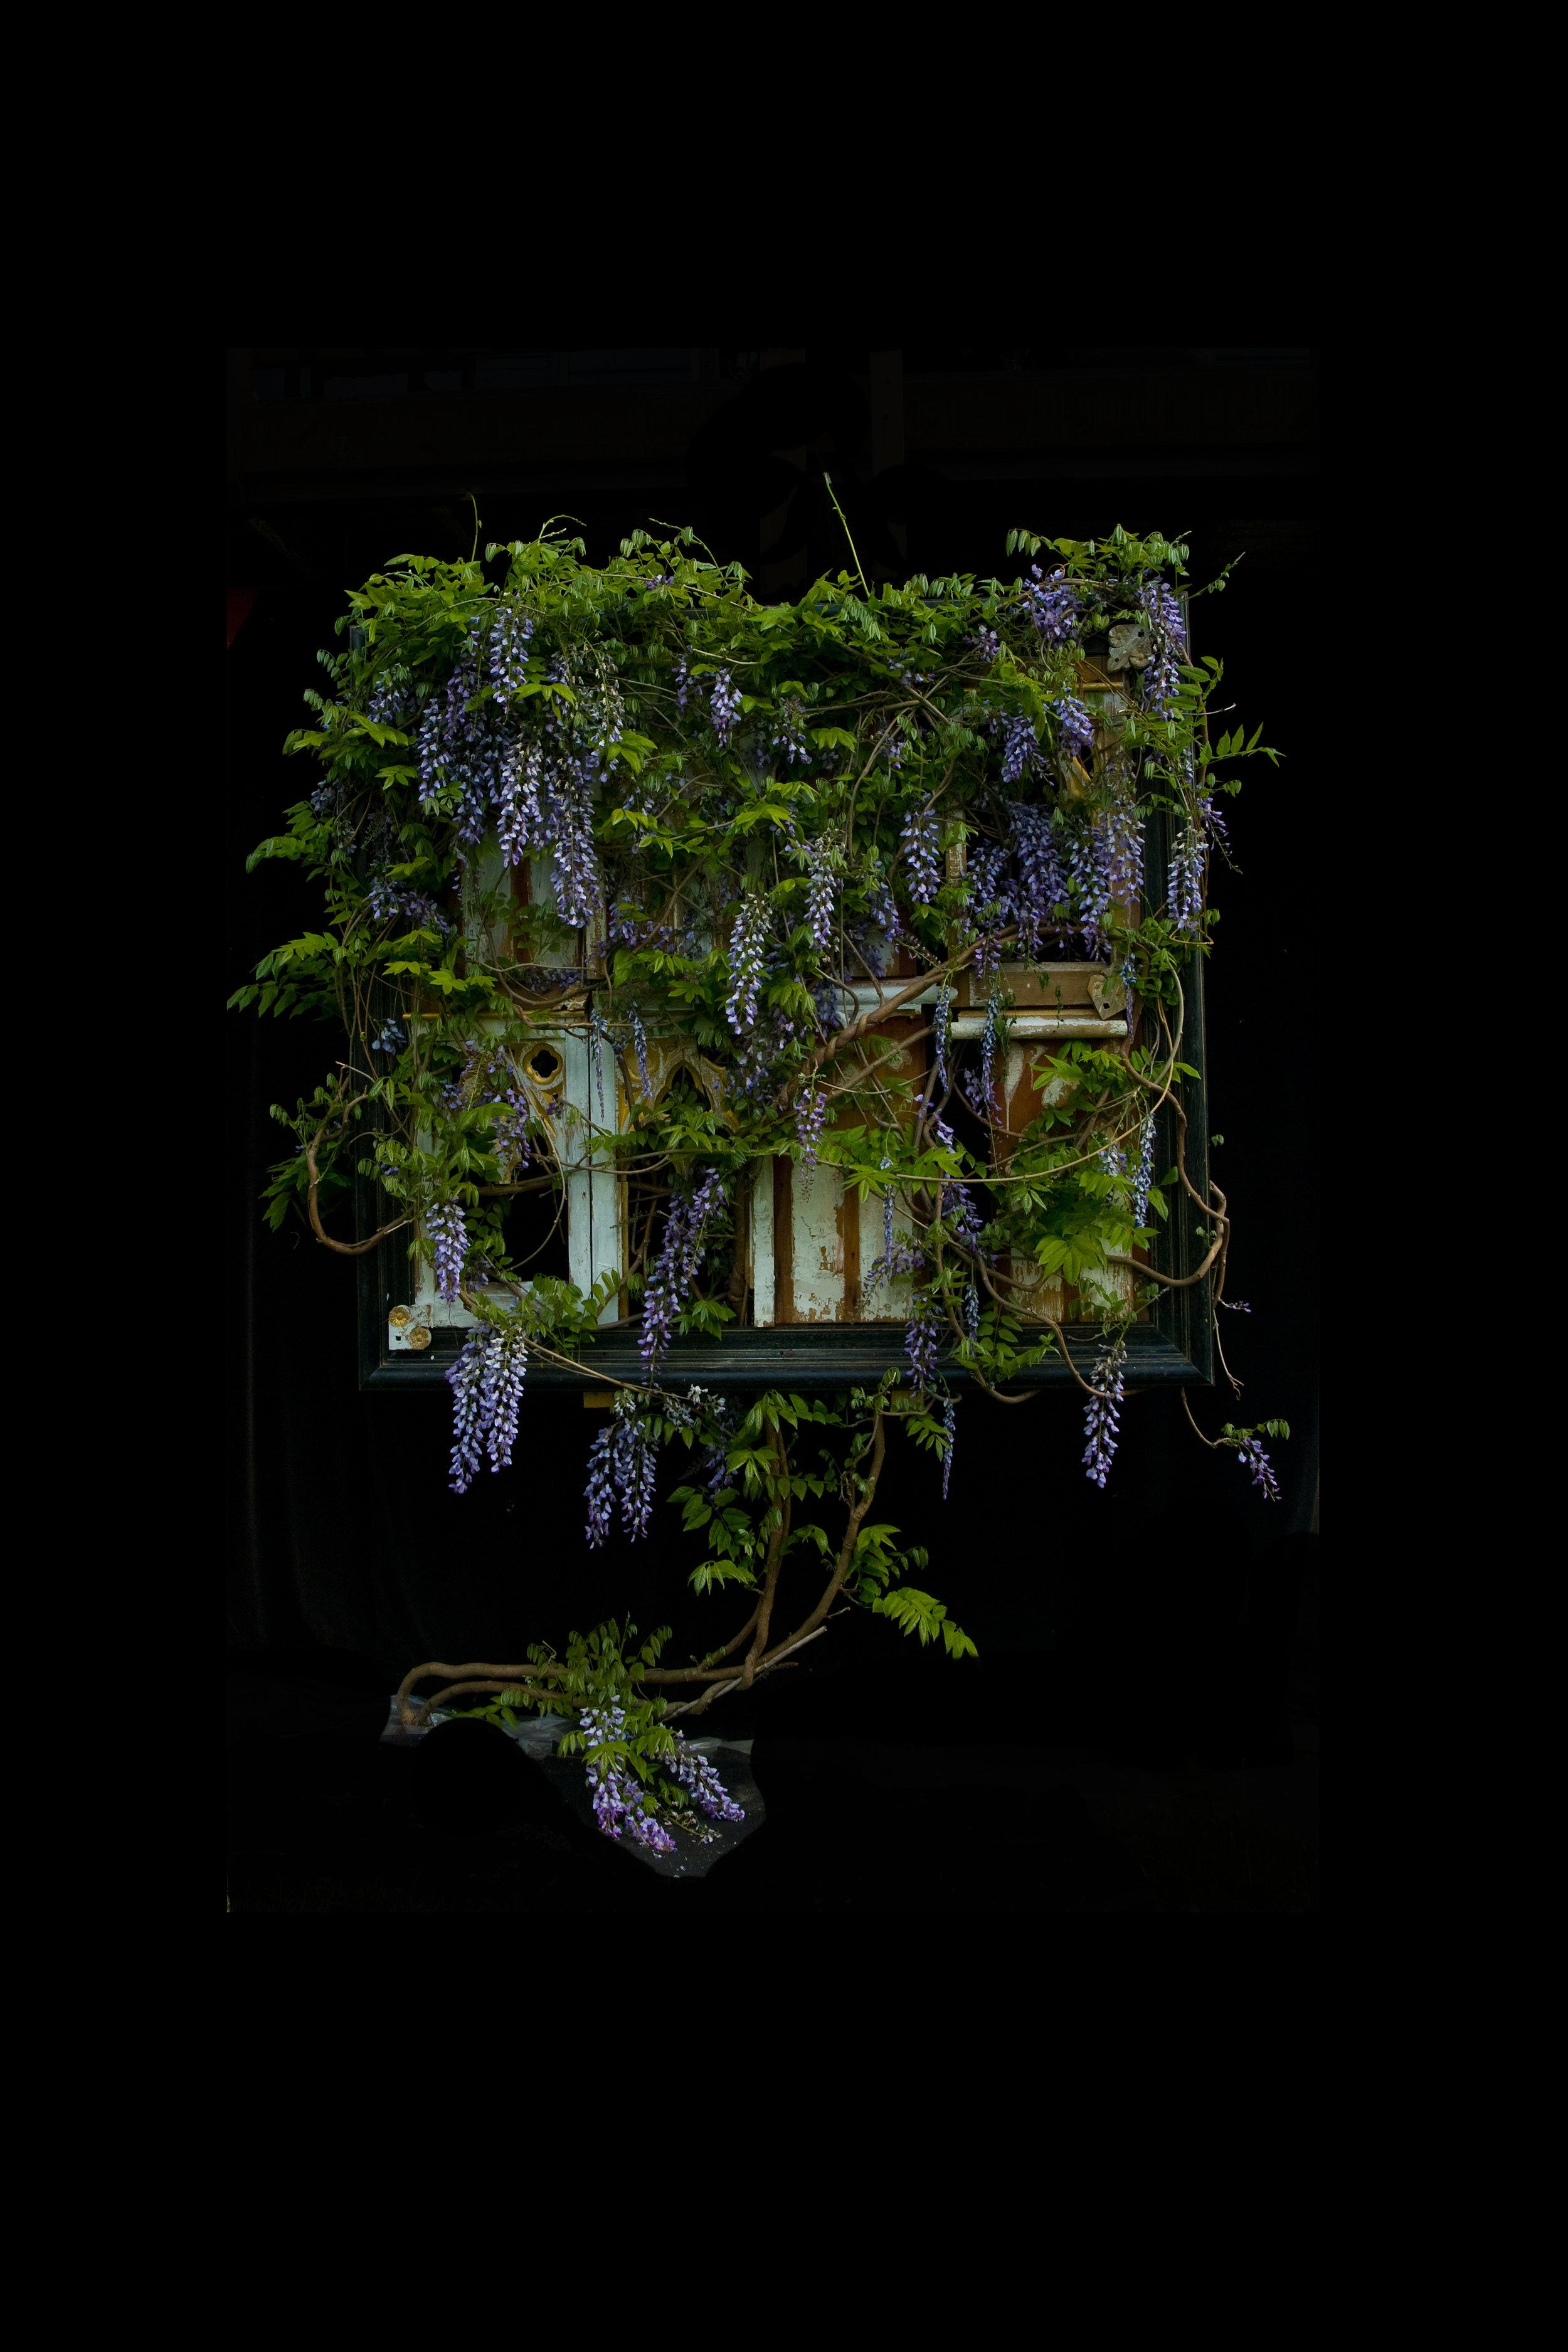 Alter Altar Full Bloom, Photograph/Sculpture, Robert Hite, 2010